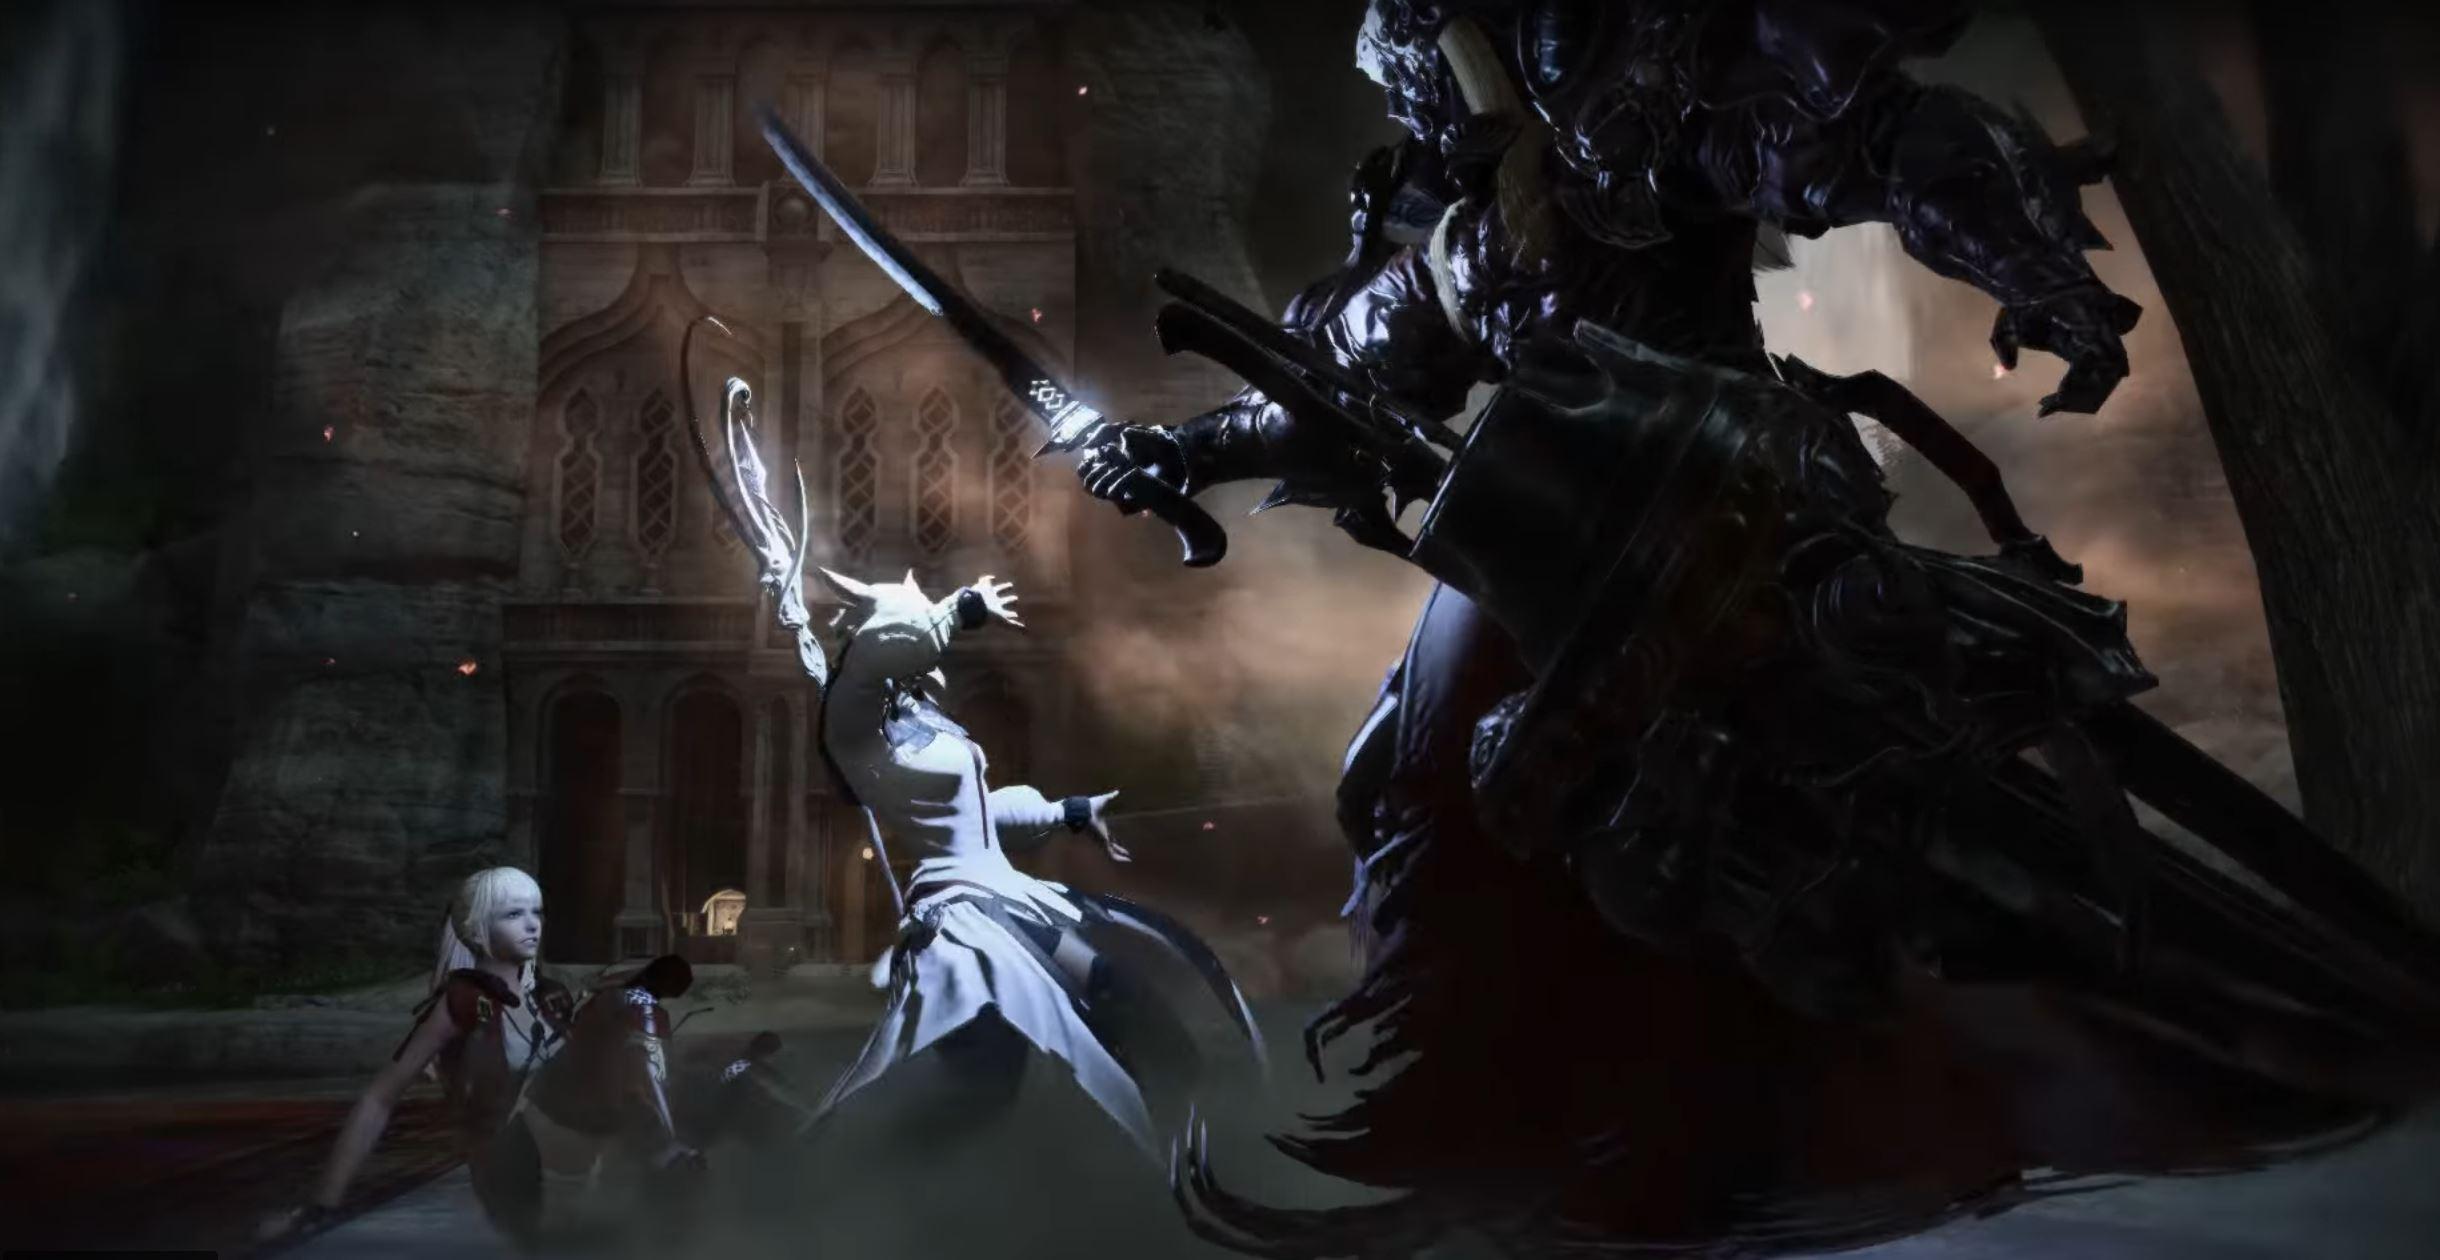 Final Fantasy XIV Stormblood – Launch-Trailer zeigt Invasion des Ostens